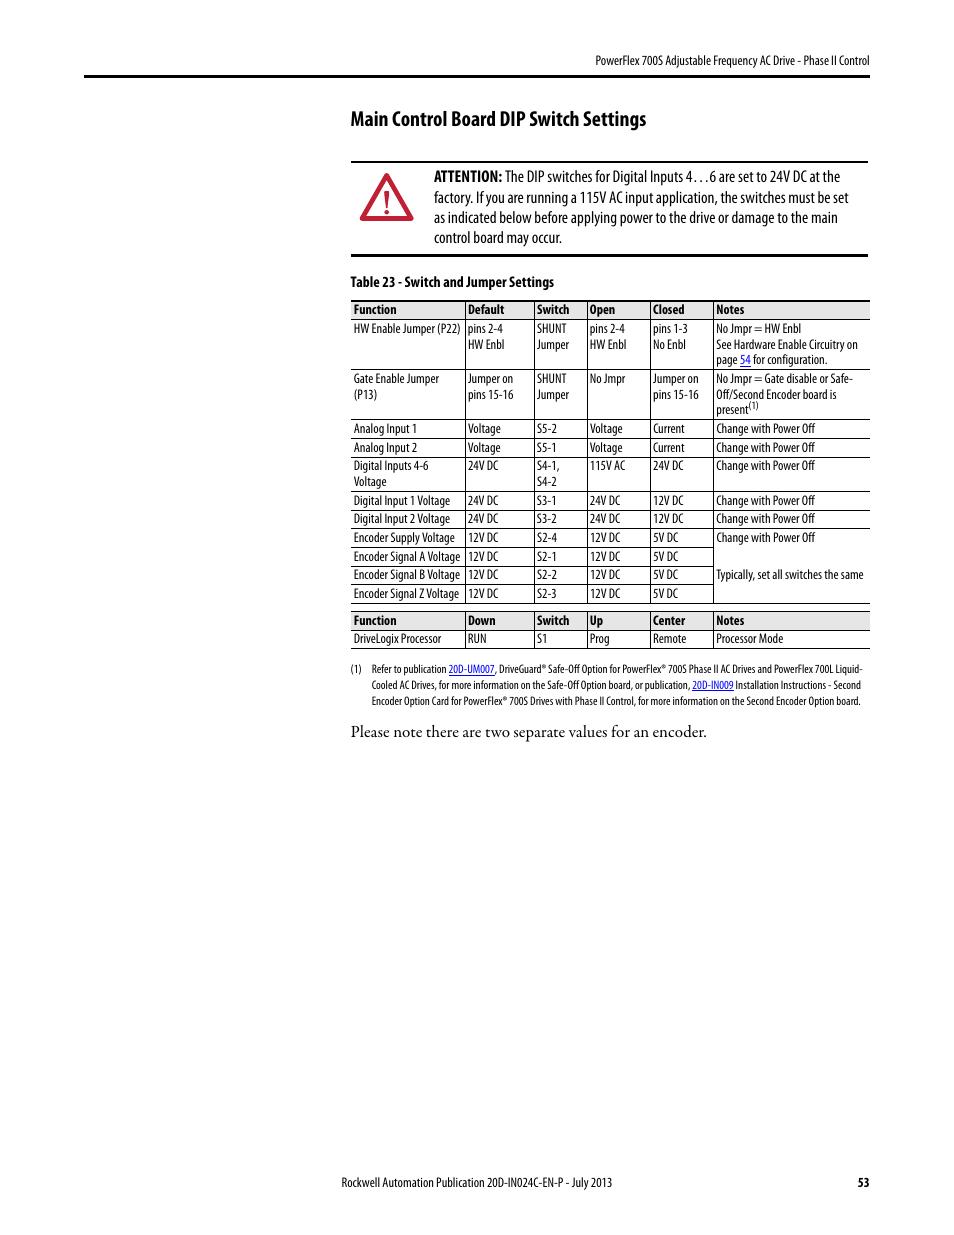 Powerflex 700l Dip Switch Diagram - Wiring Diagram •